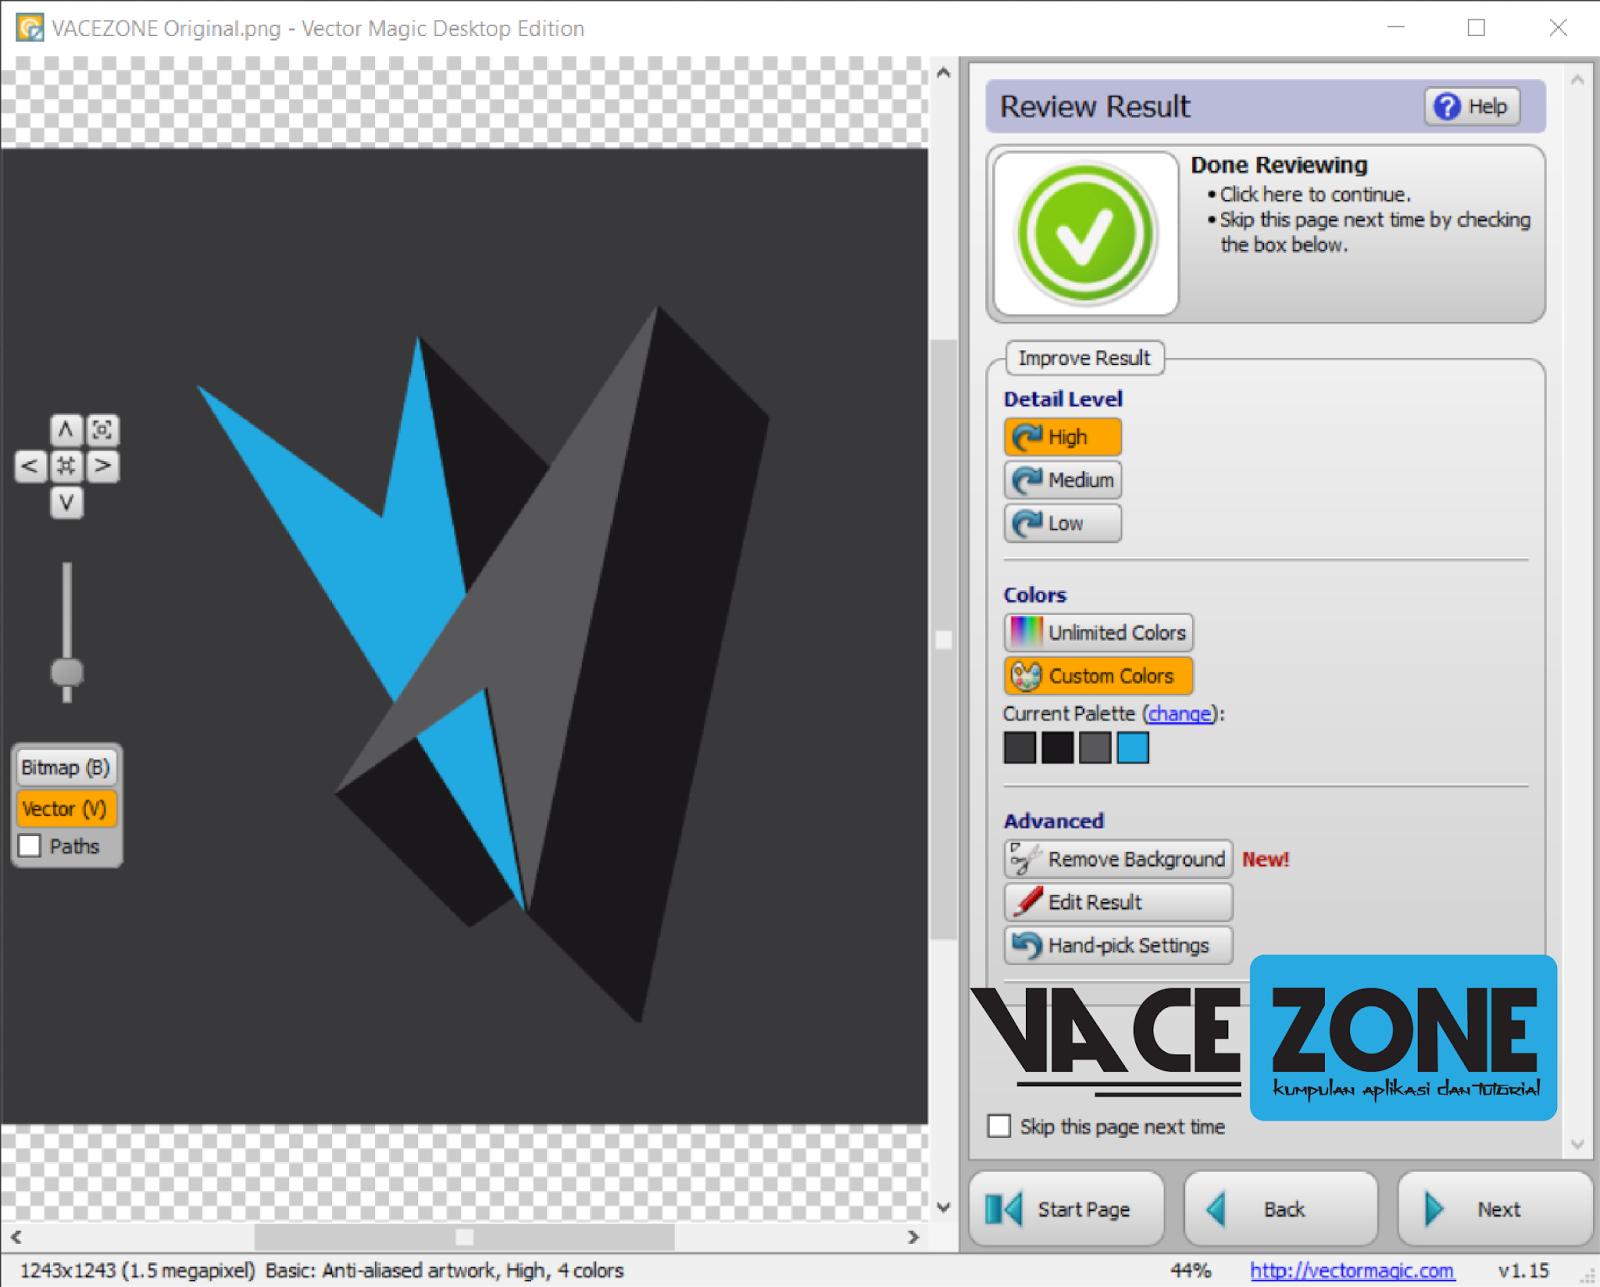 vector magic desktop edition 1.15